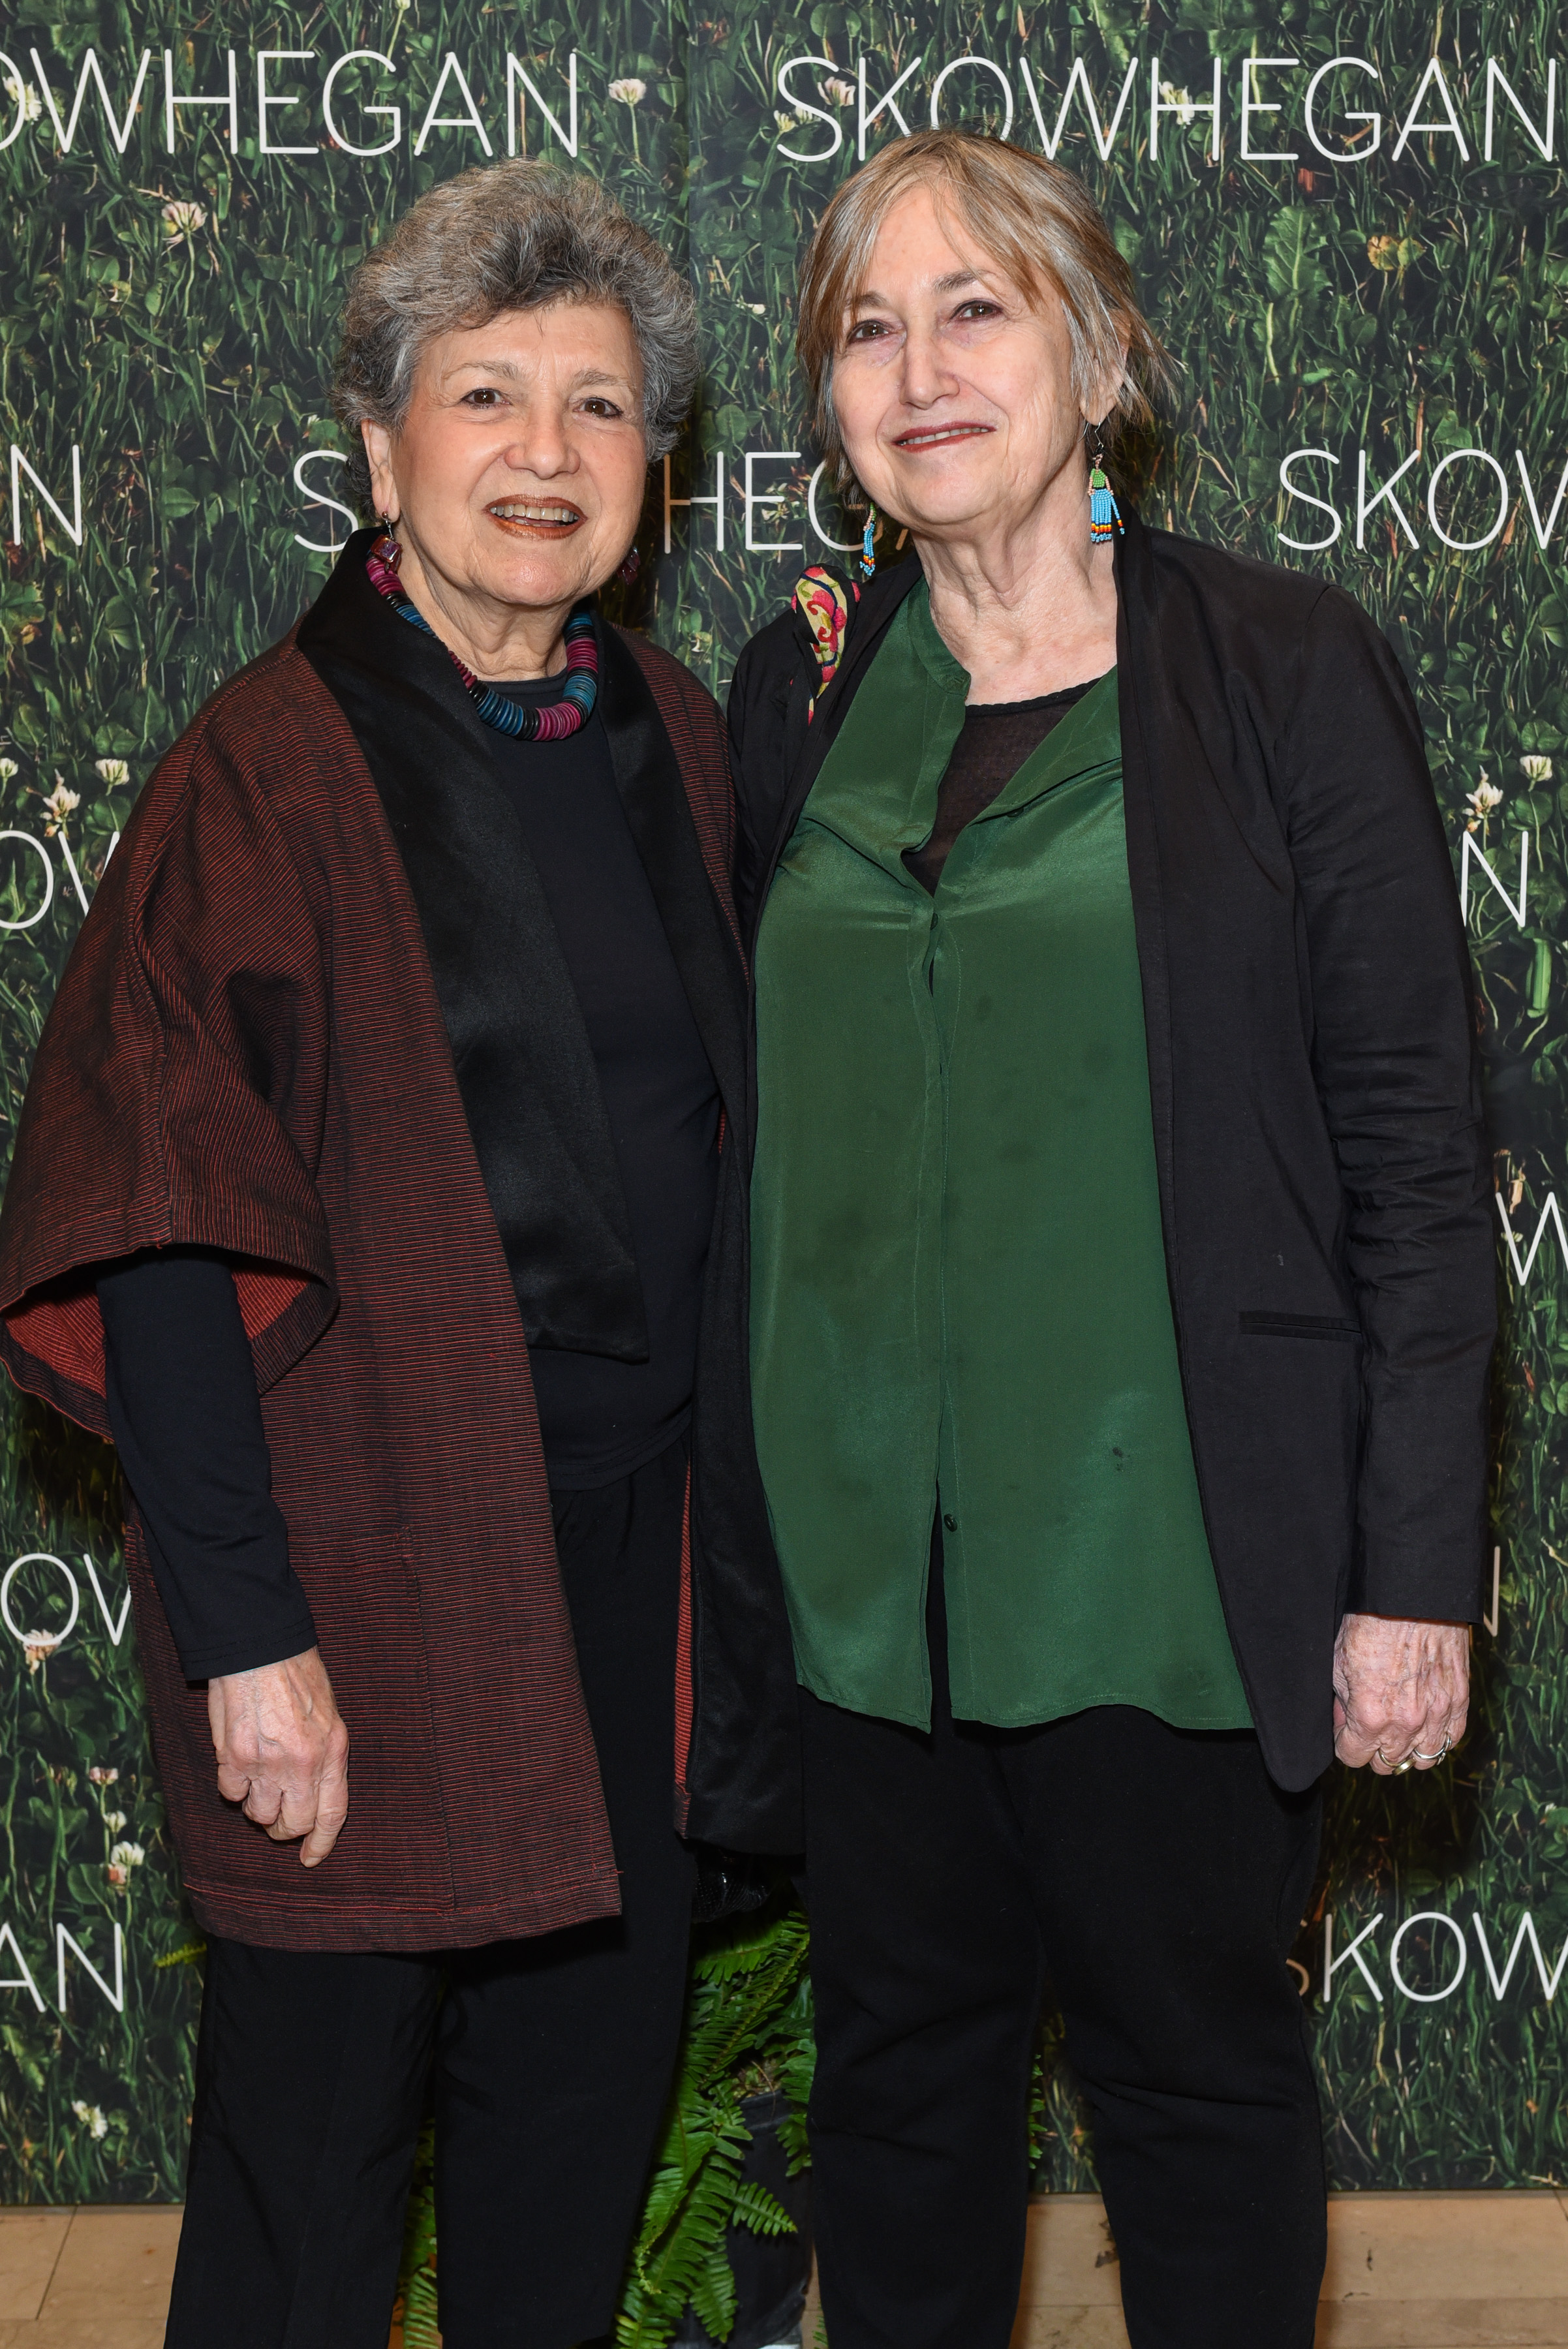 ?, Joyce Kozloff==Skowhegan Awards Dinner 2018==The Plaza Hotel, New York, NY==April 24, 2018==�Patrick McMullan==Photo - Presley Ann/PMC====